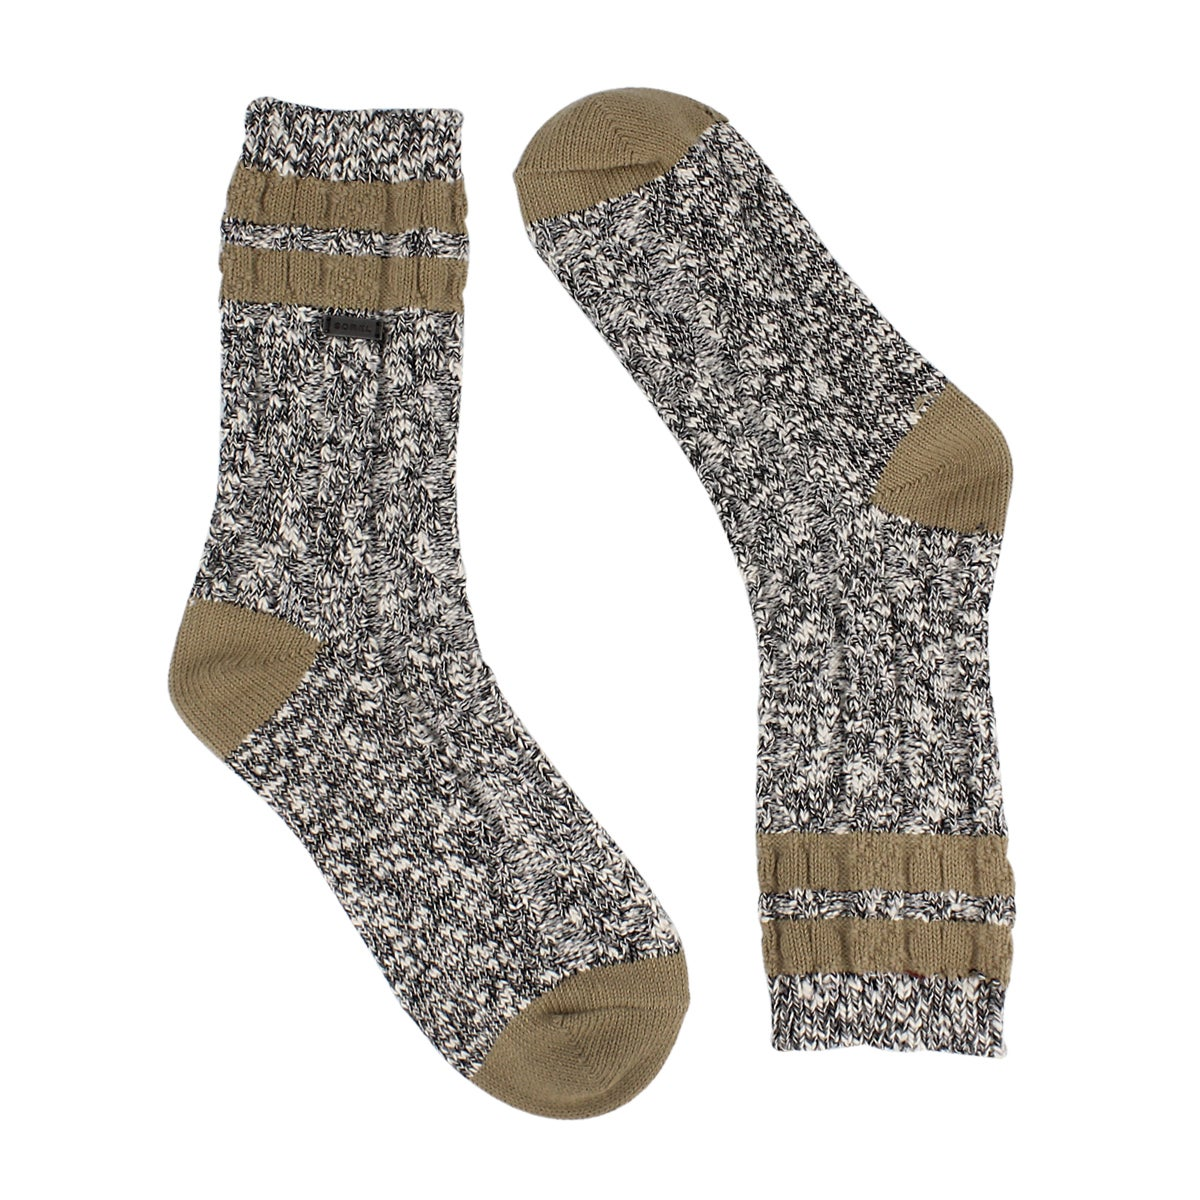 Women's VARSITY STRIPE black/quarry tall socks